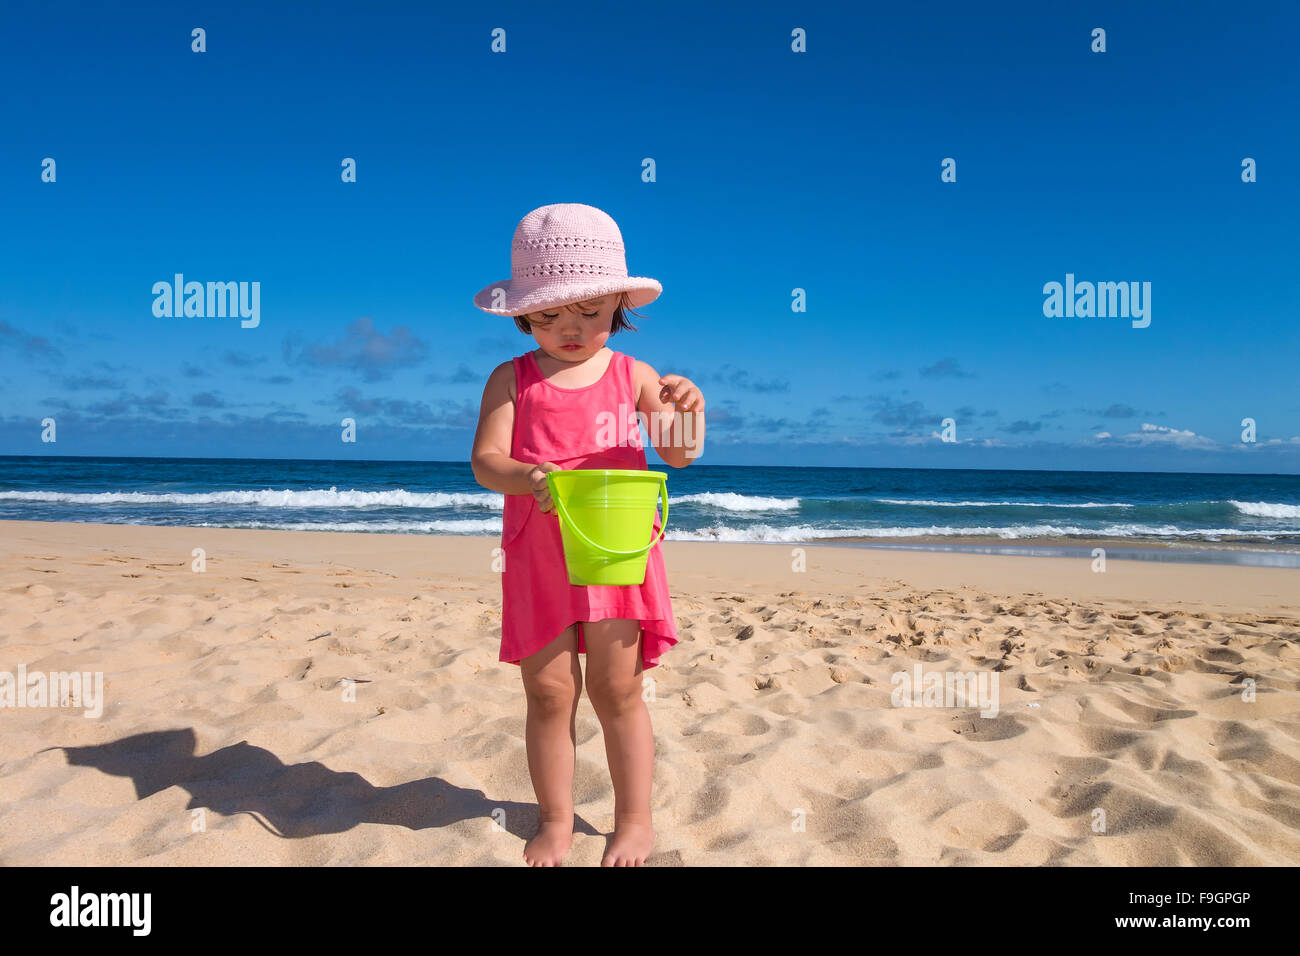 Toddler girl holding a green bucket at the beach, Kauai island - Stock Image